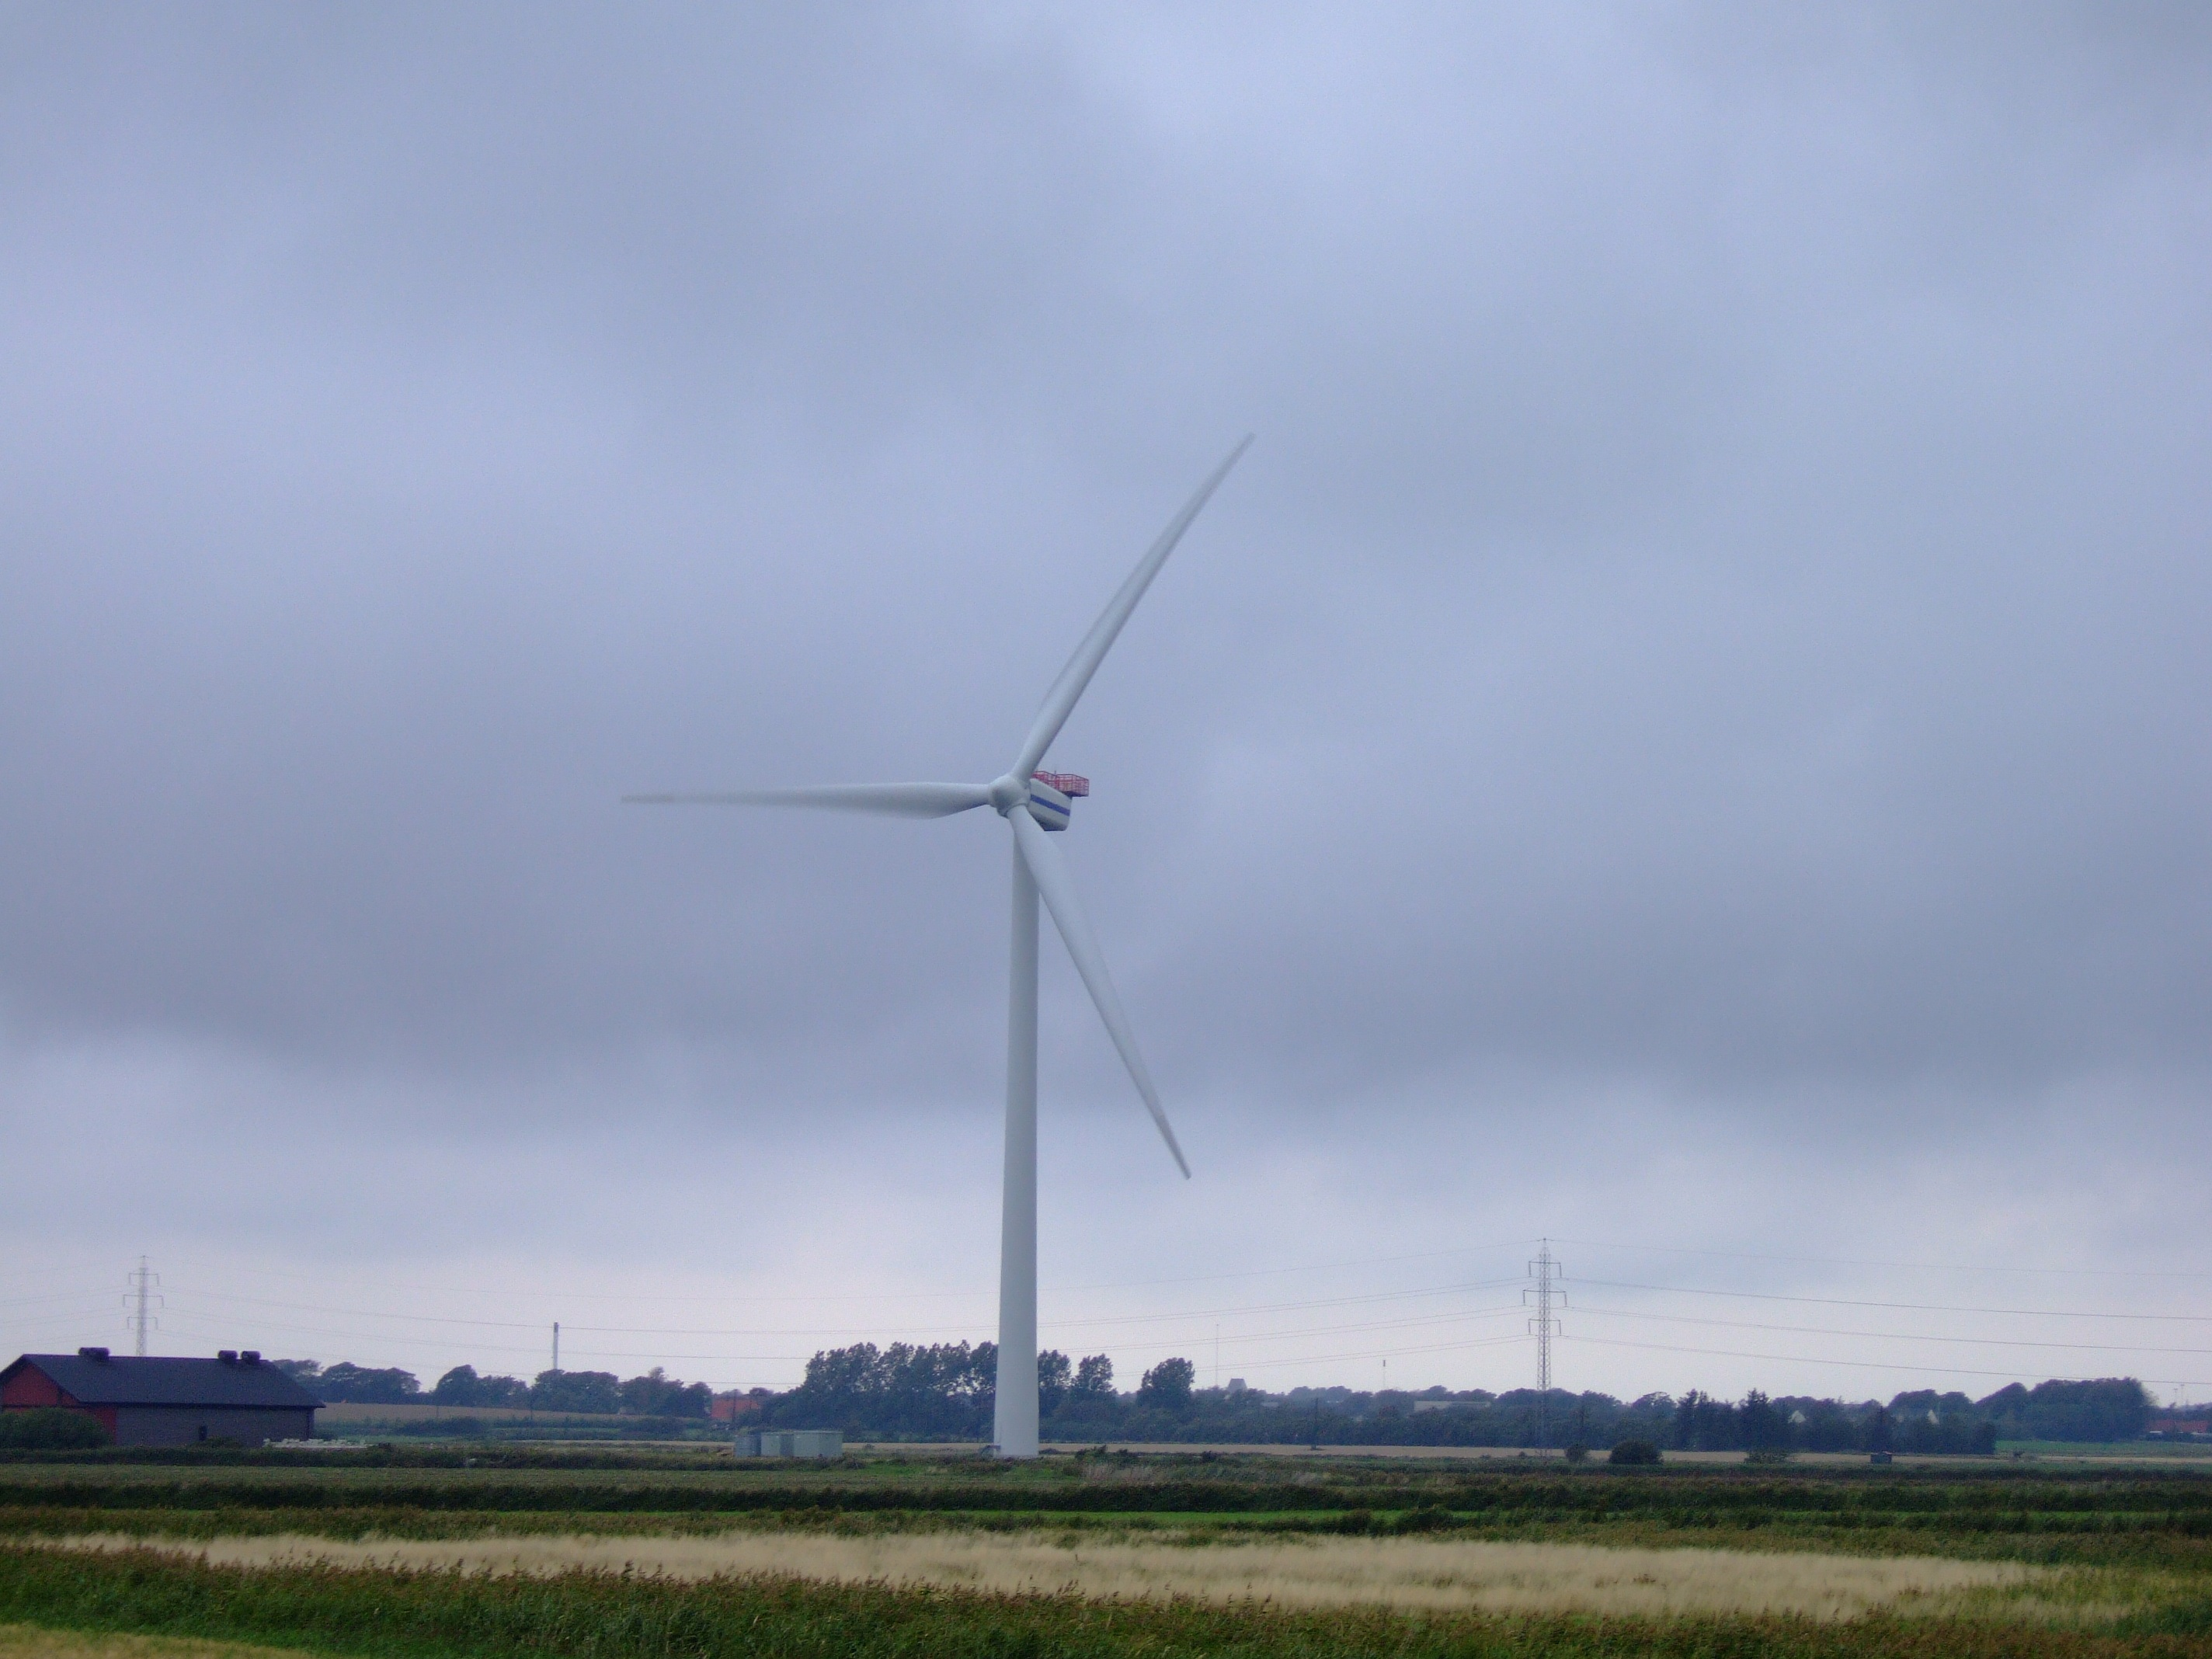 vestas v80 2 0 2 00 mw wind turbine rh en wind turbine models com